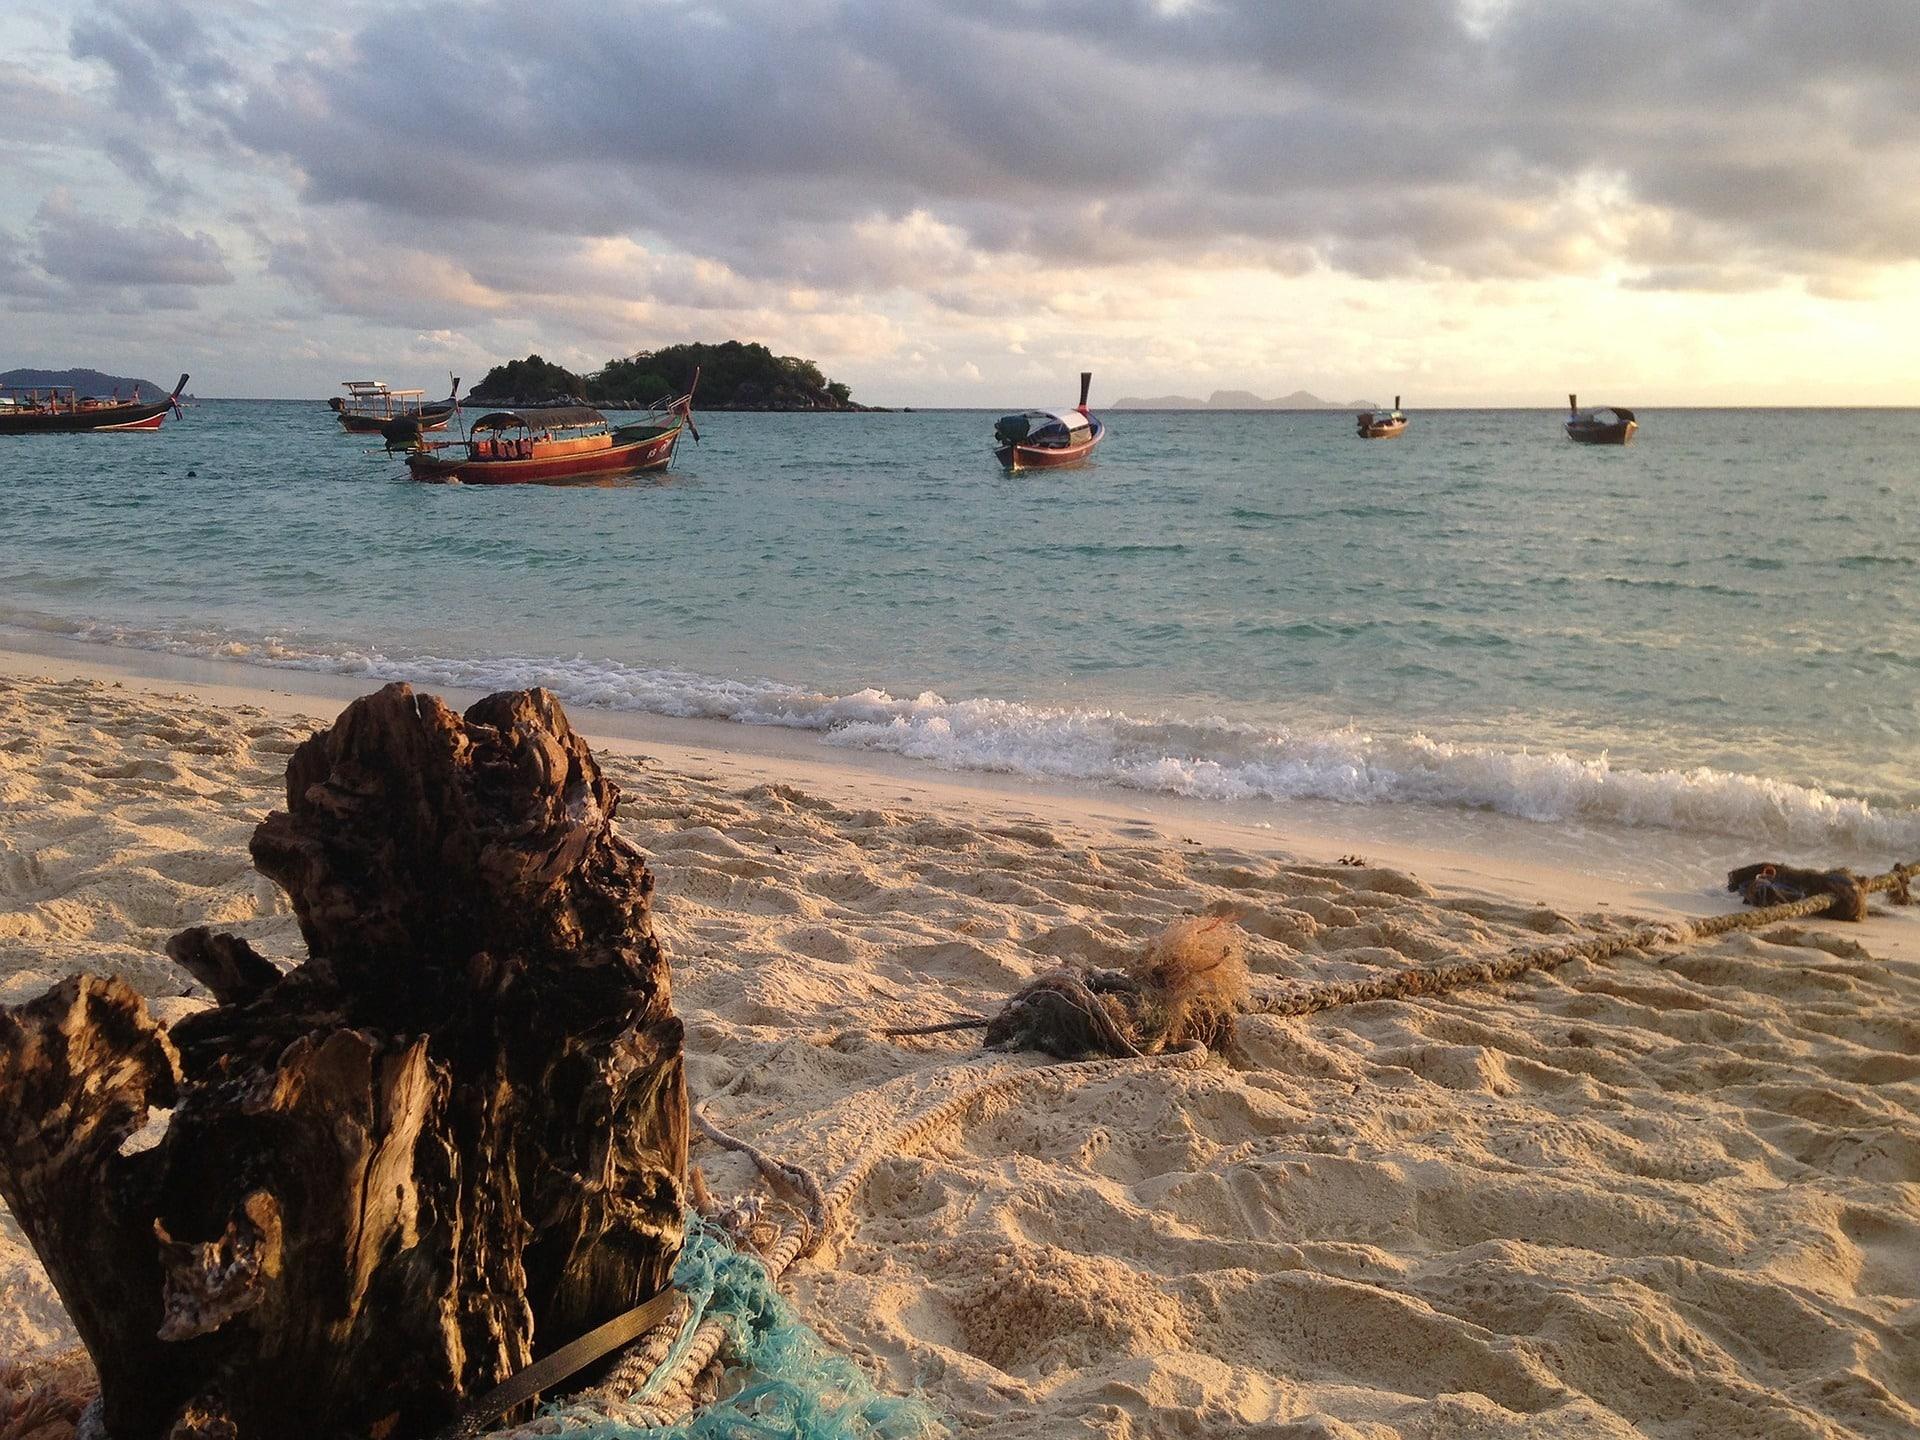 L'île de Kho Lipe, en Thaïlande.